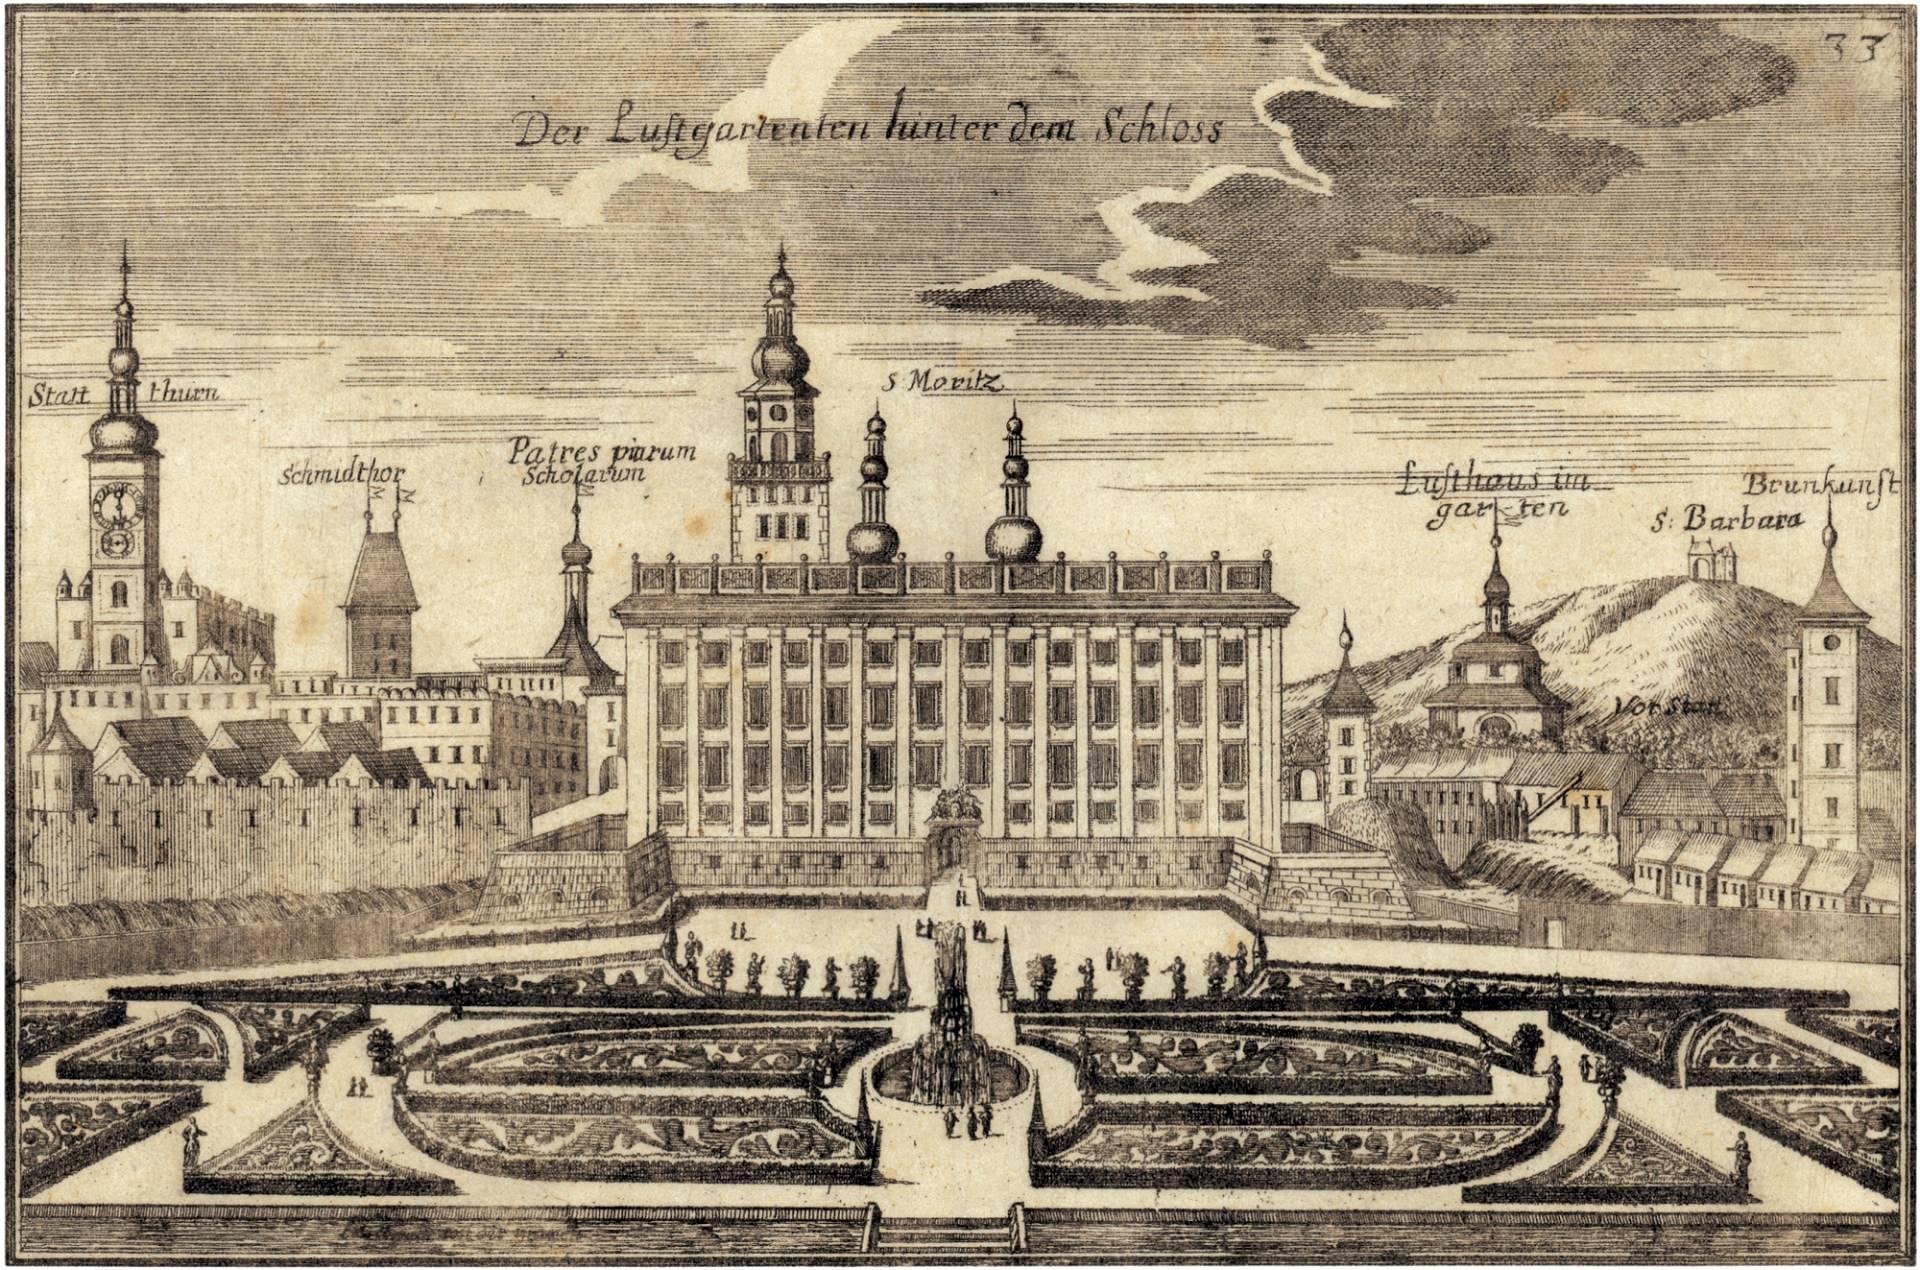 Chateau with Garden in Kroměříž, by Justus van den Nypoort (1691) after Georg Matthias Vischer